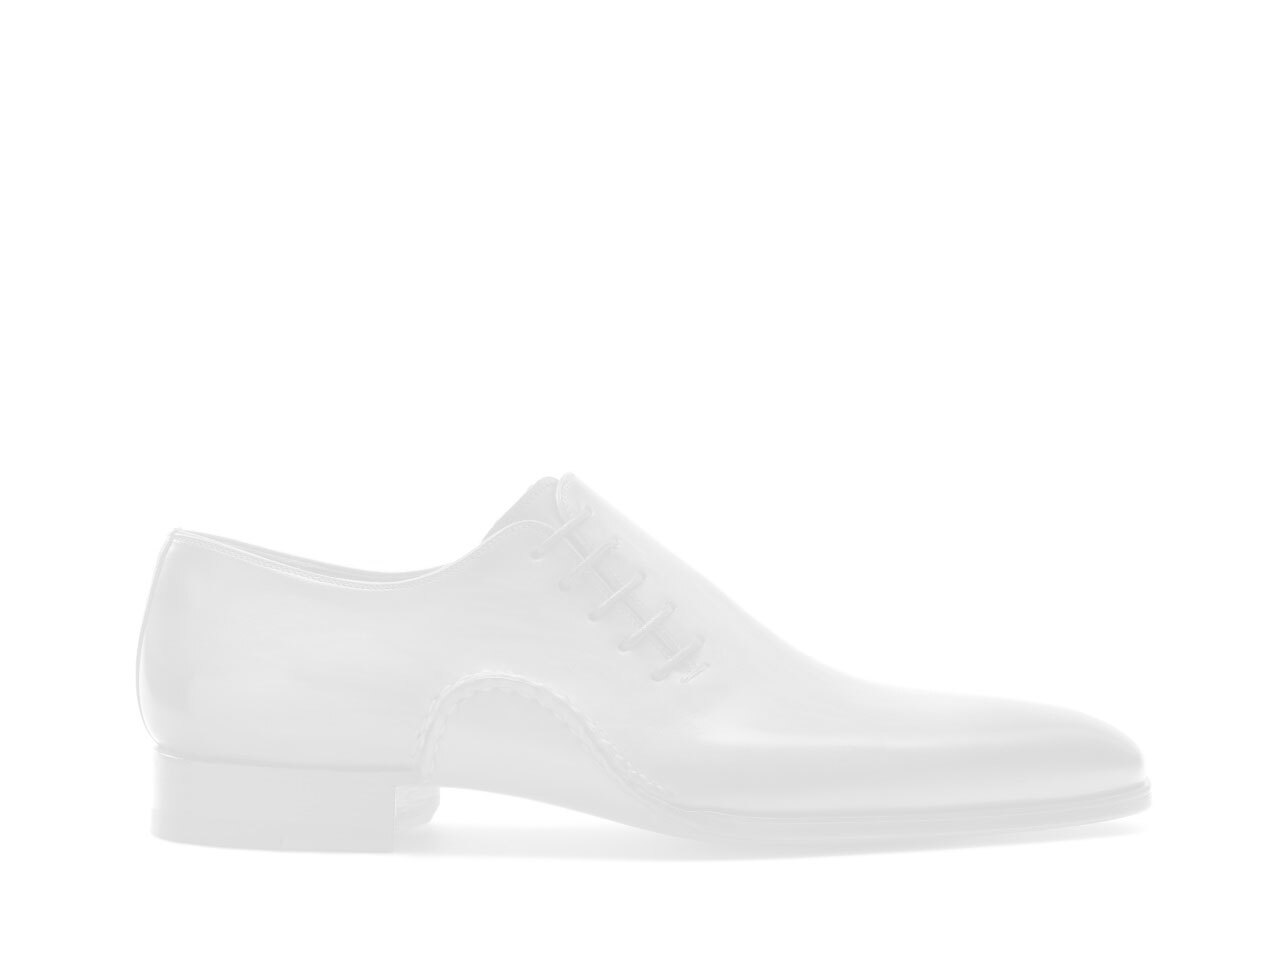 Cognac brown wingtip brogue shoes for men - Magnanni